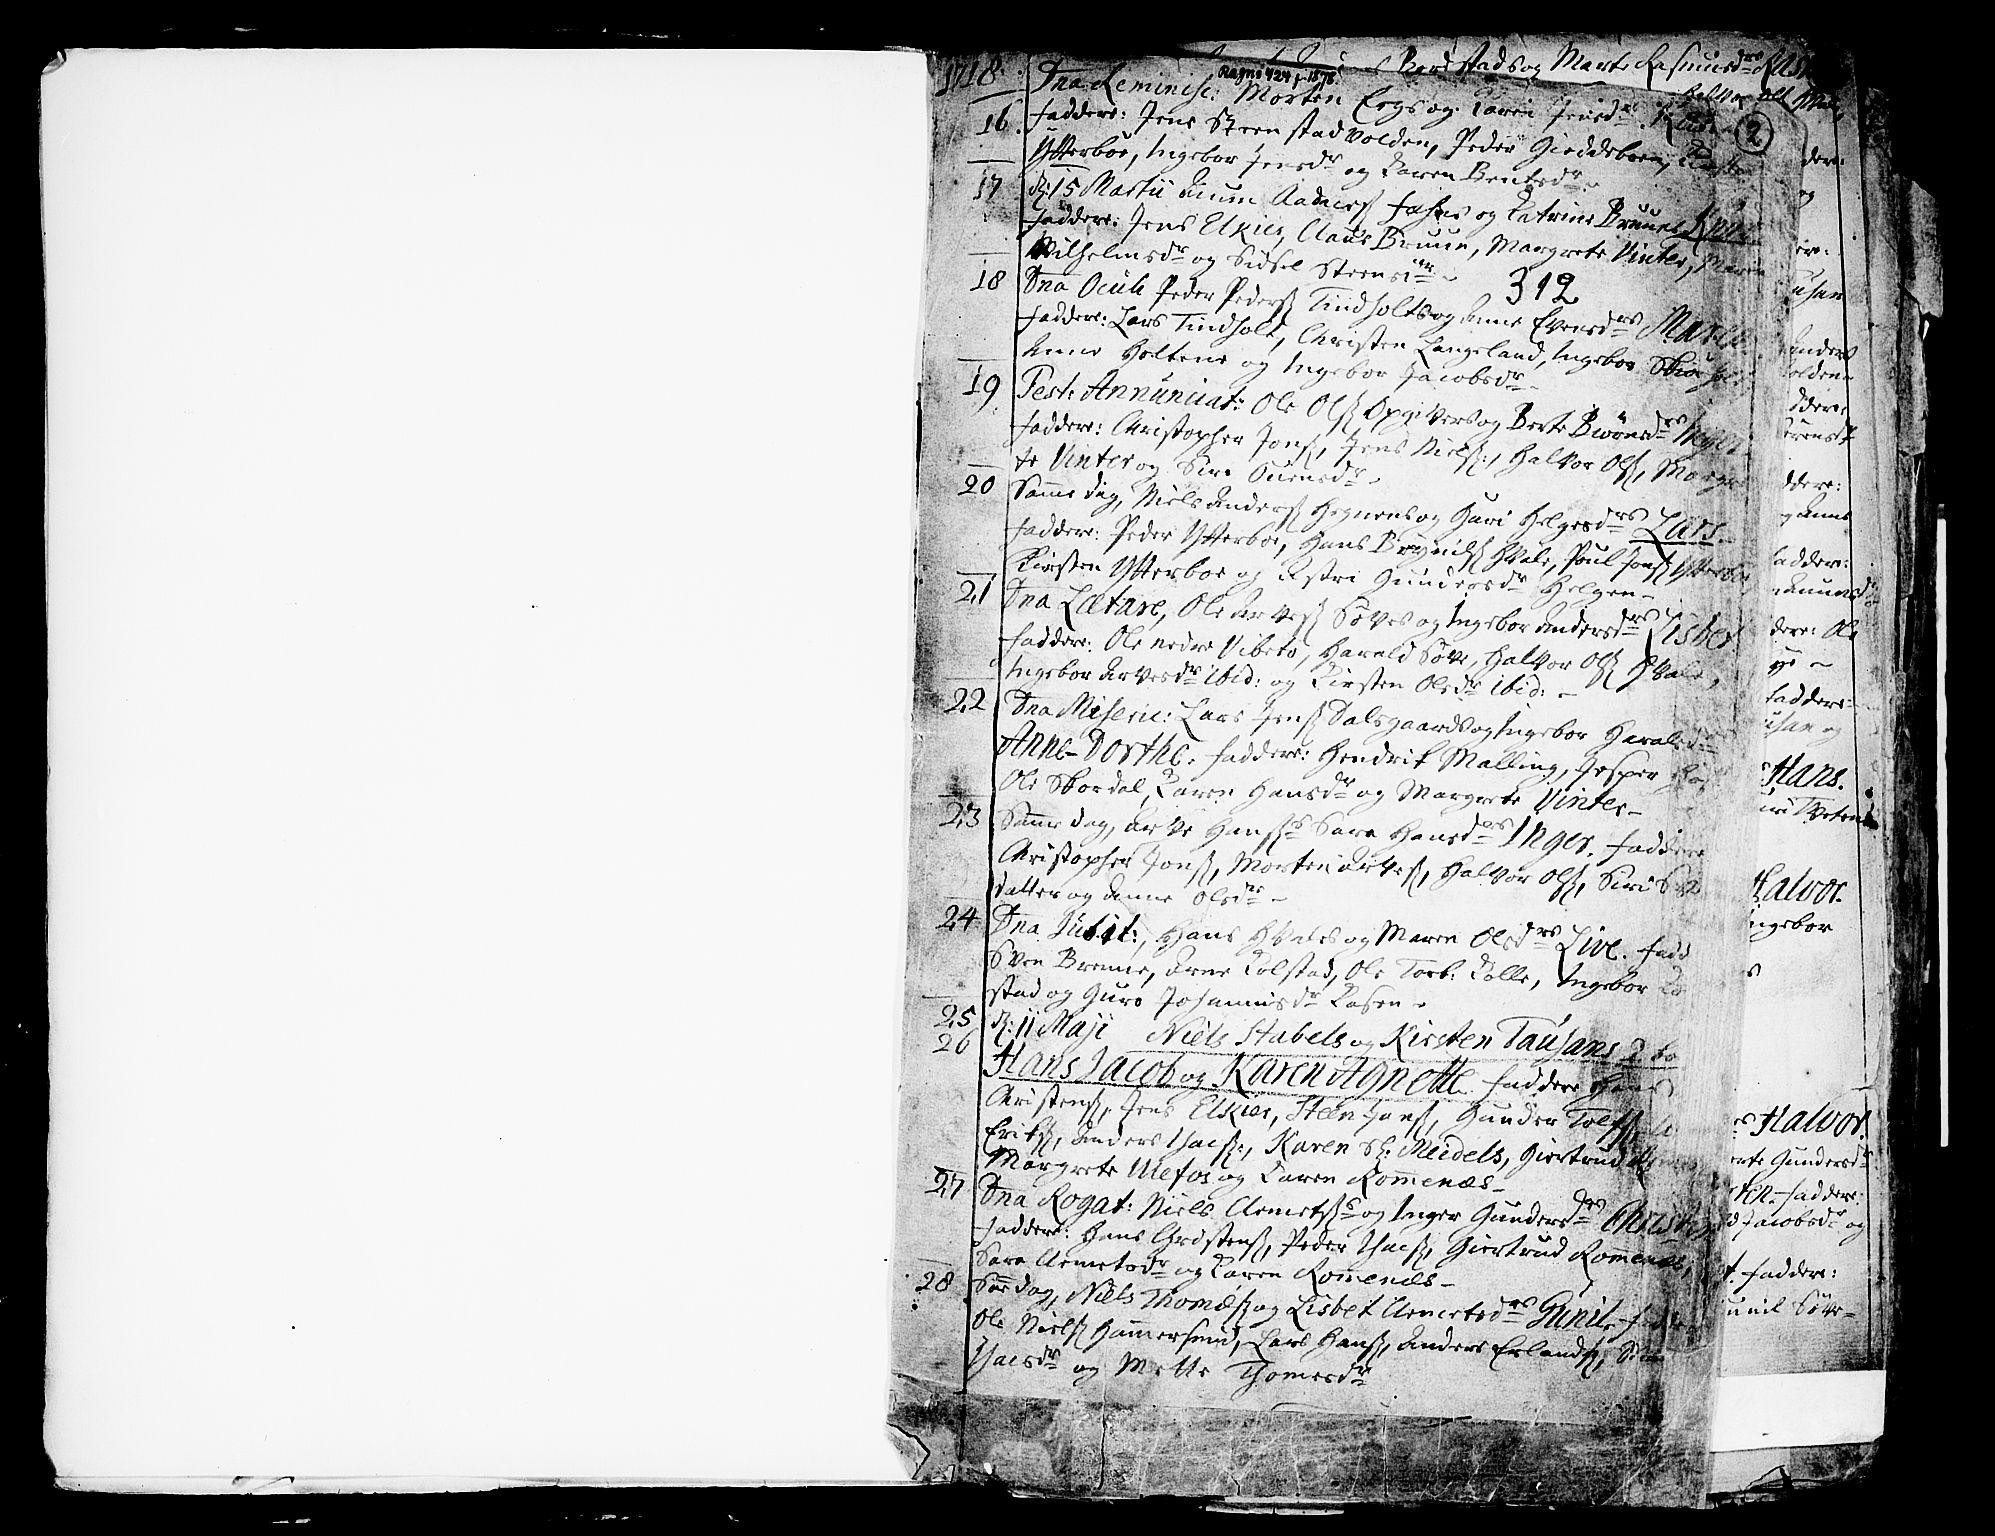 SAKO, Holla kirkebøker, F/Fa/L0001: Ministerialbok nr. 1, 1717-1779, s. 2